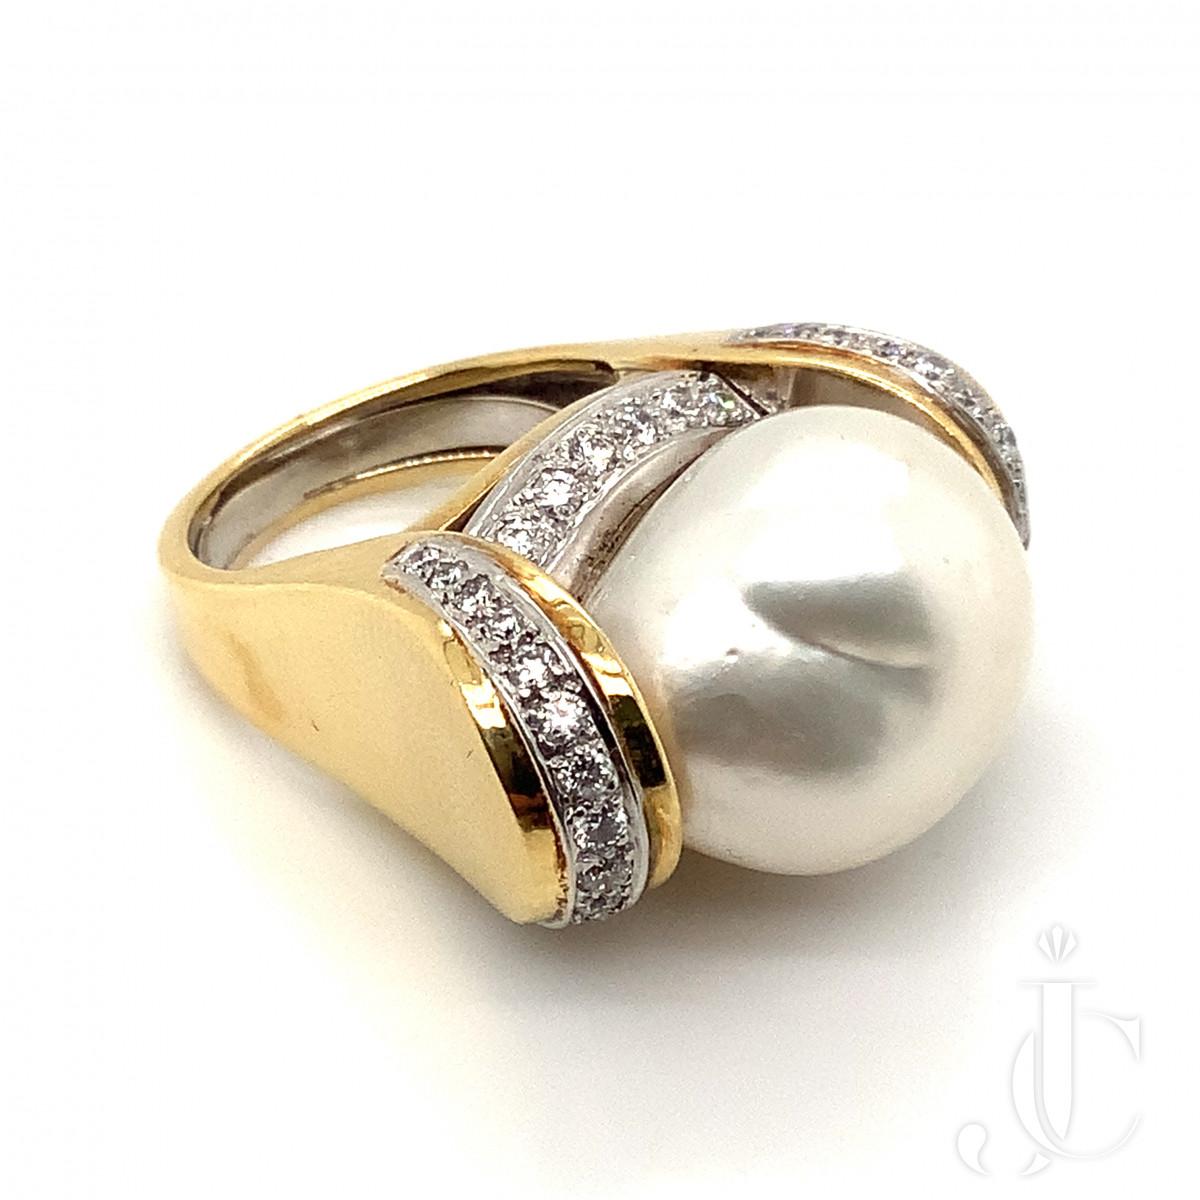 David Webb Pearl and Diamond Ring